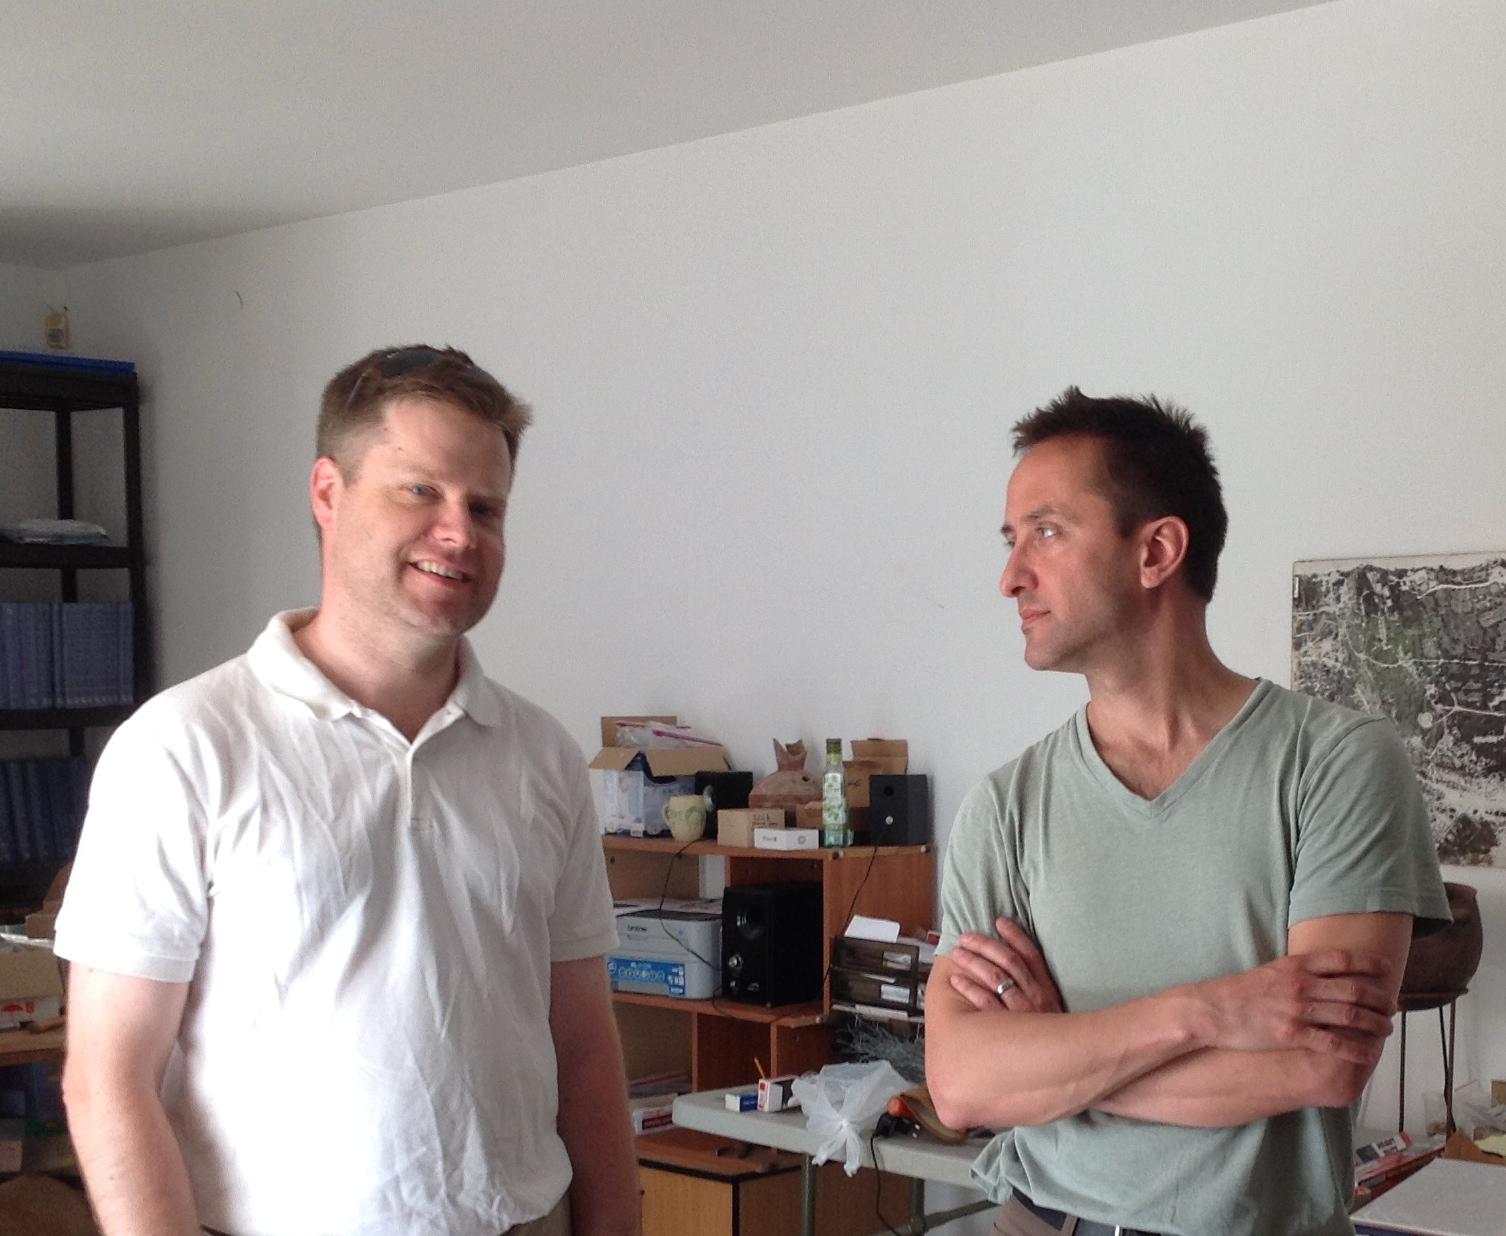 Co-Director Daniel Master and Assistant Director Adam Aja